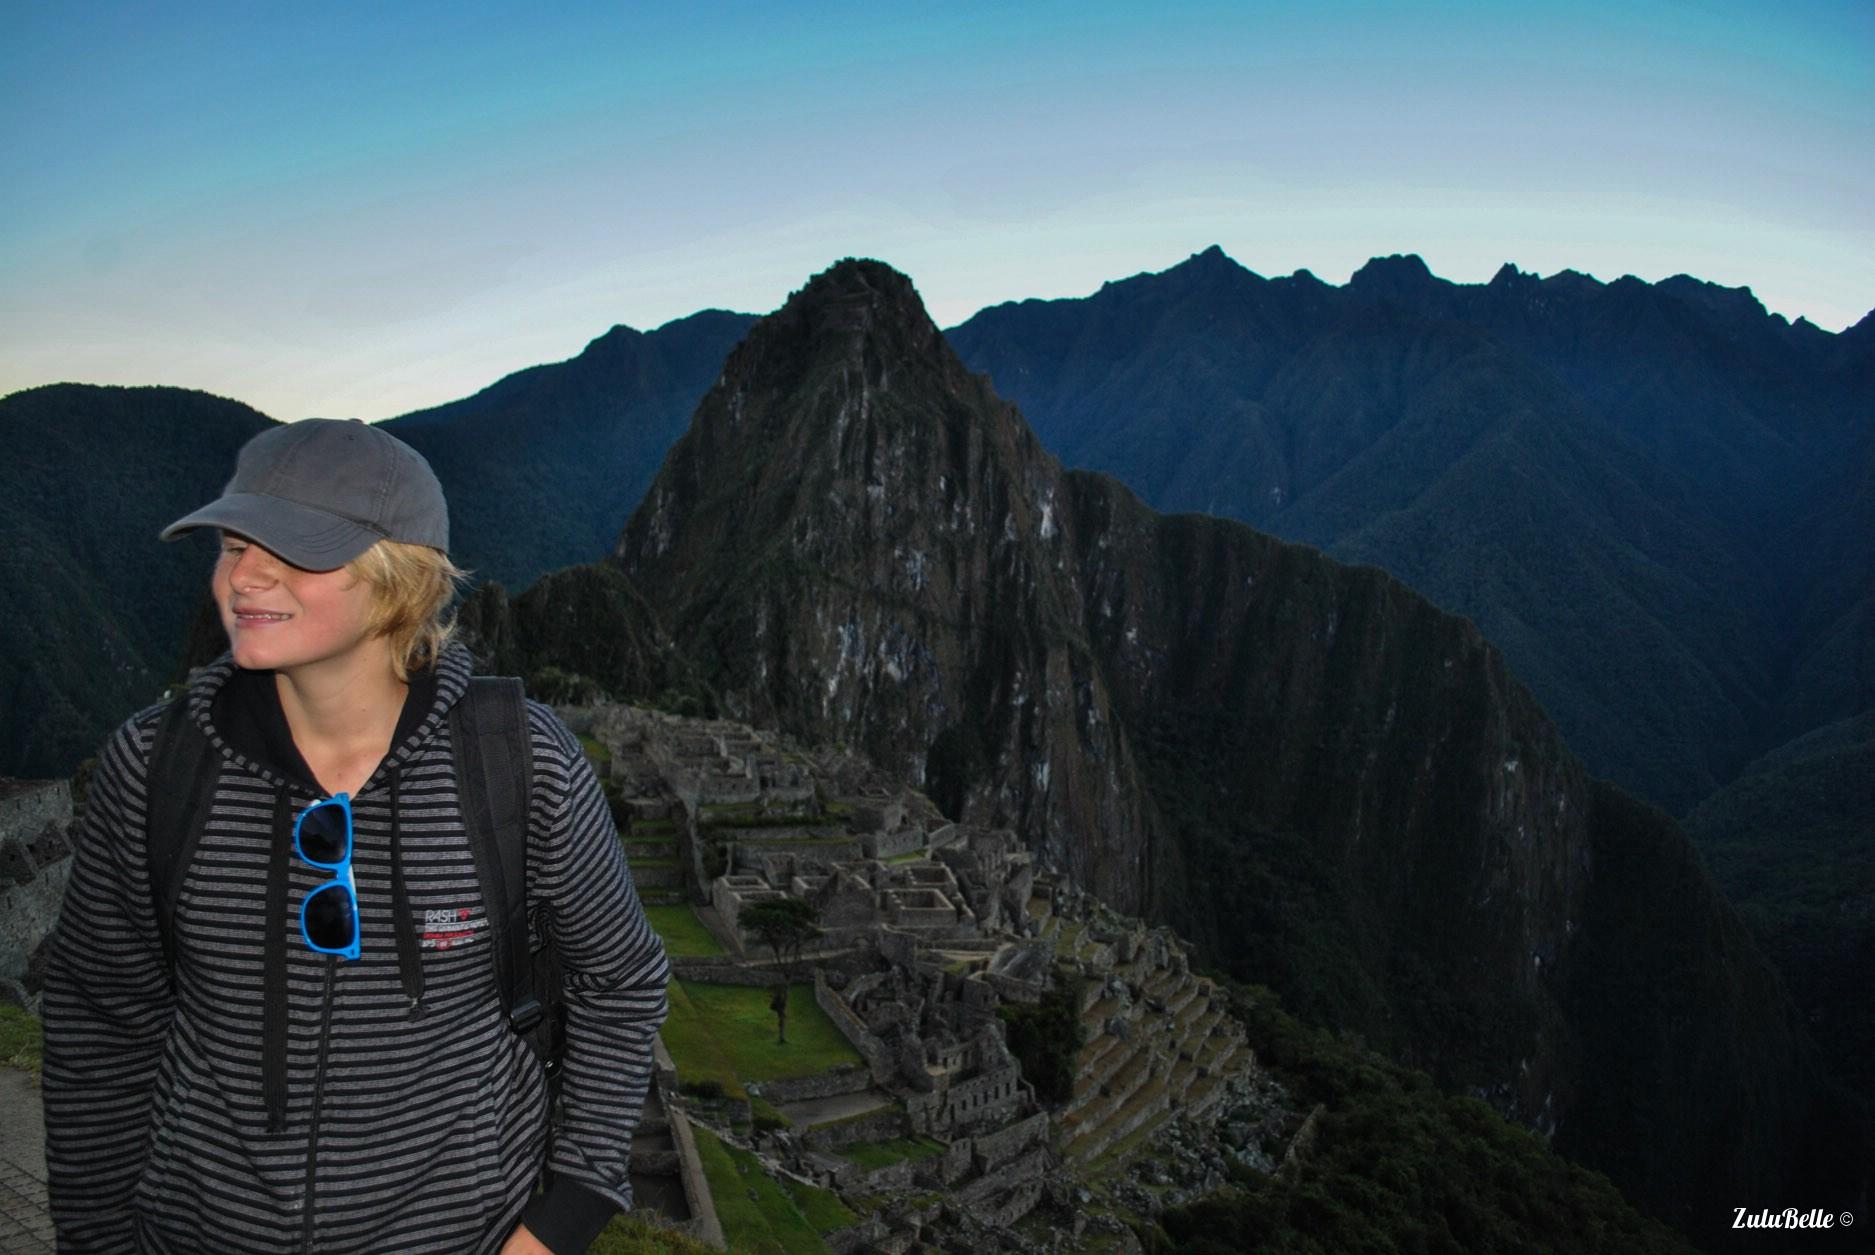 Keelan at Machu Picchu, A2A